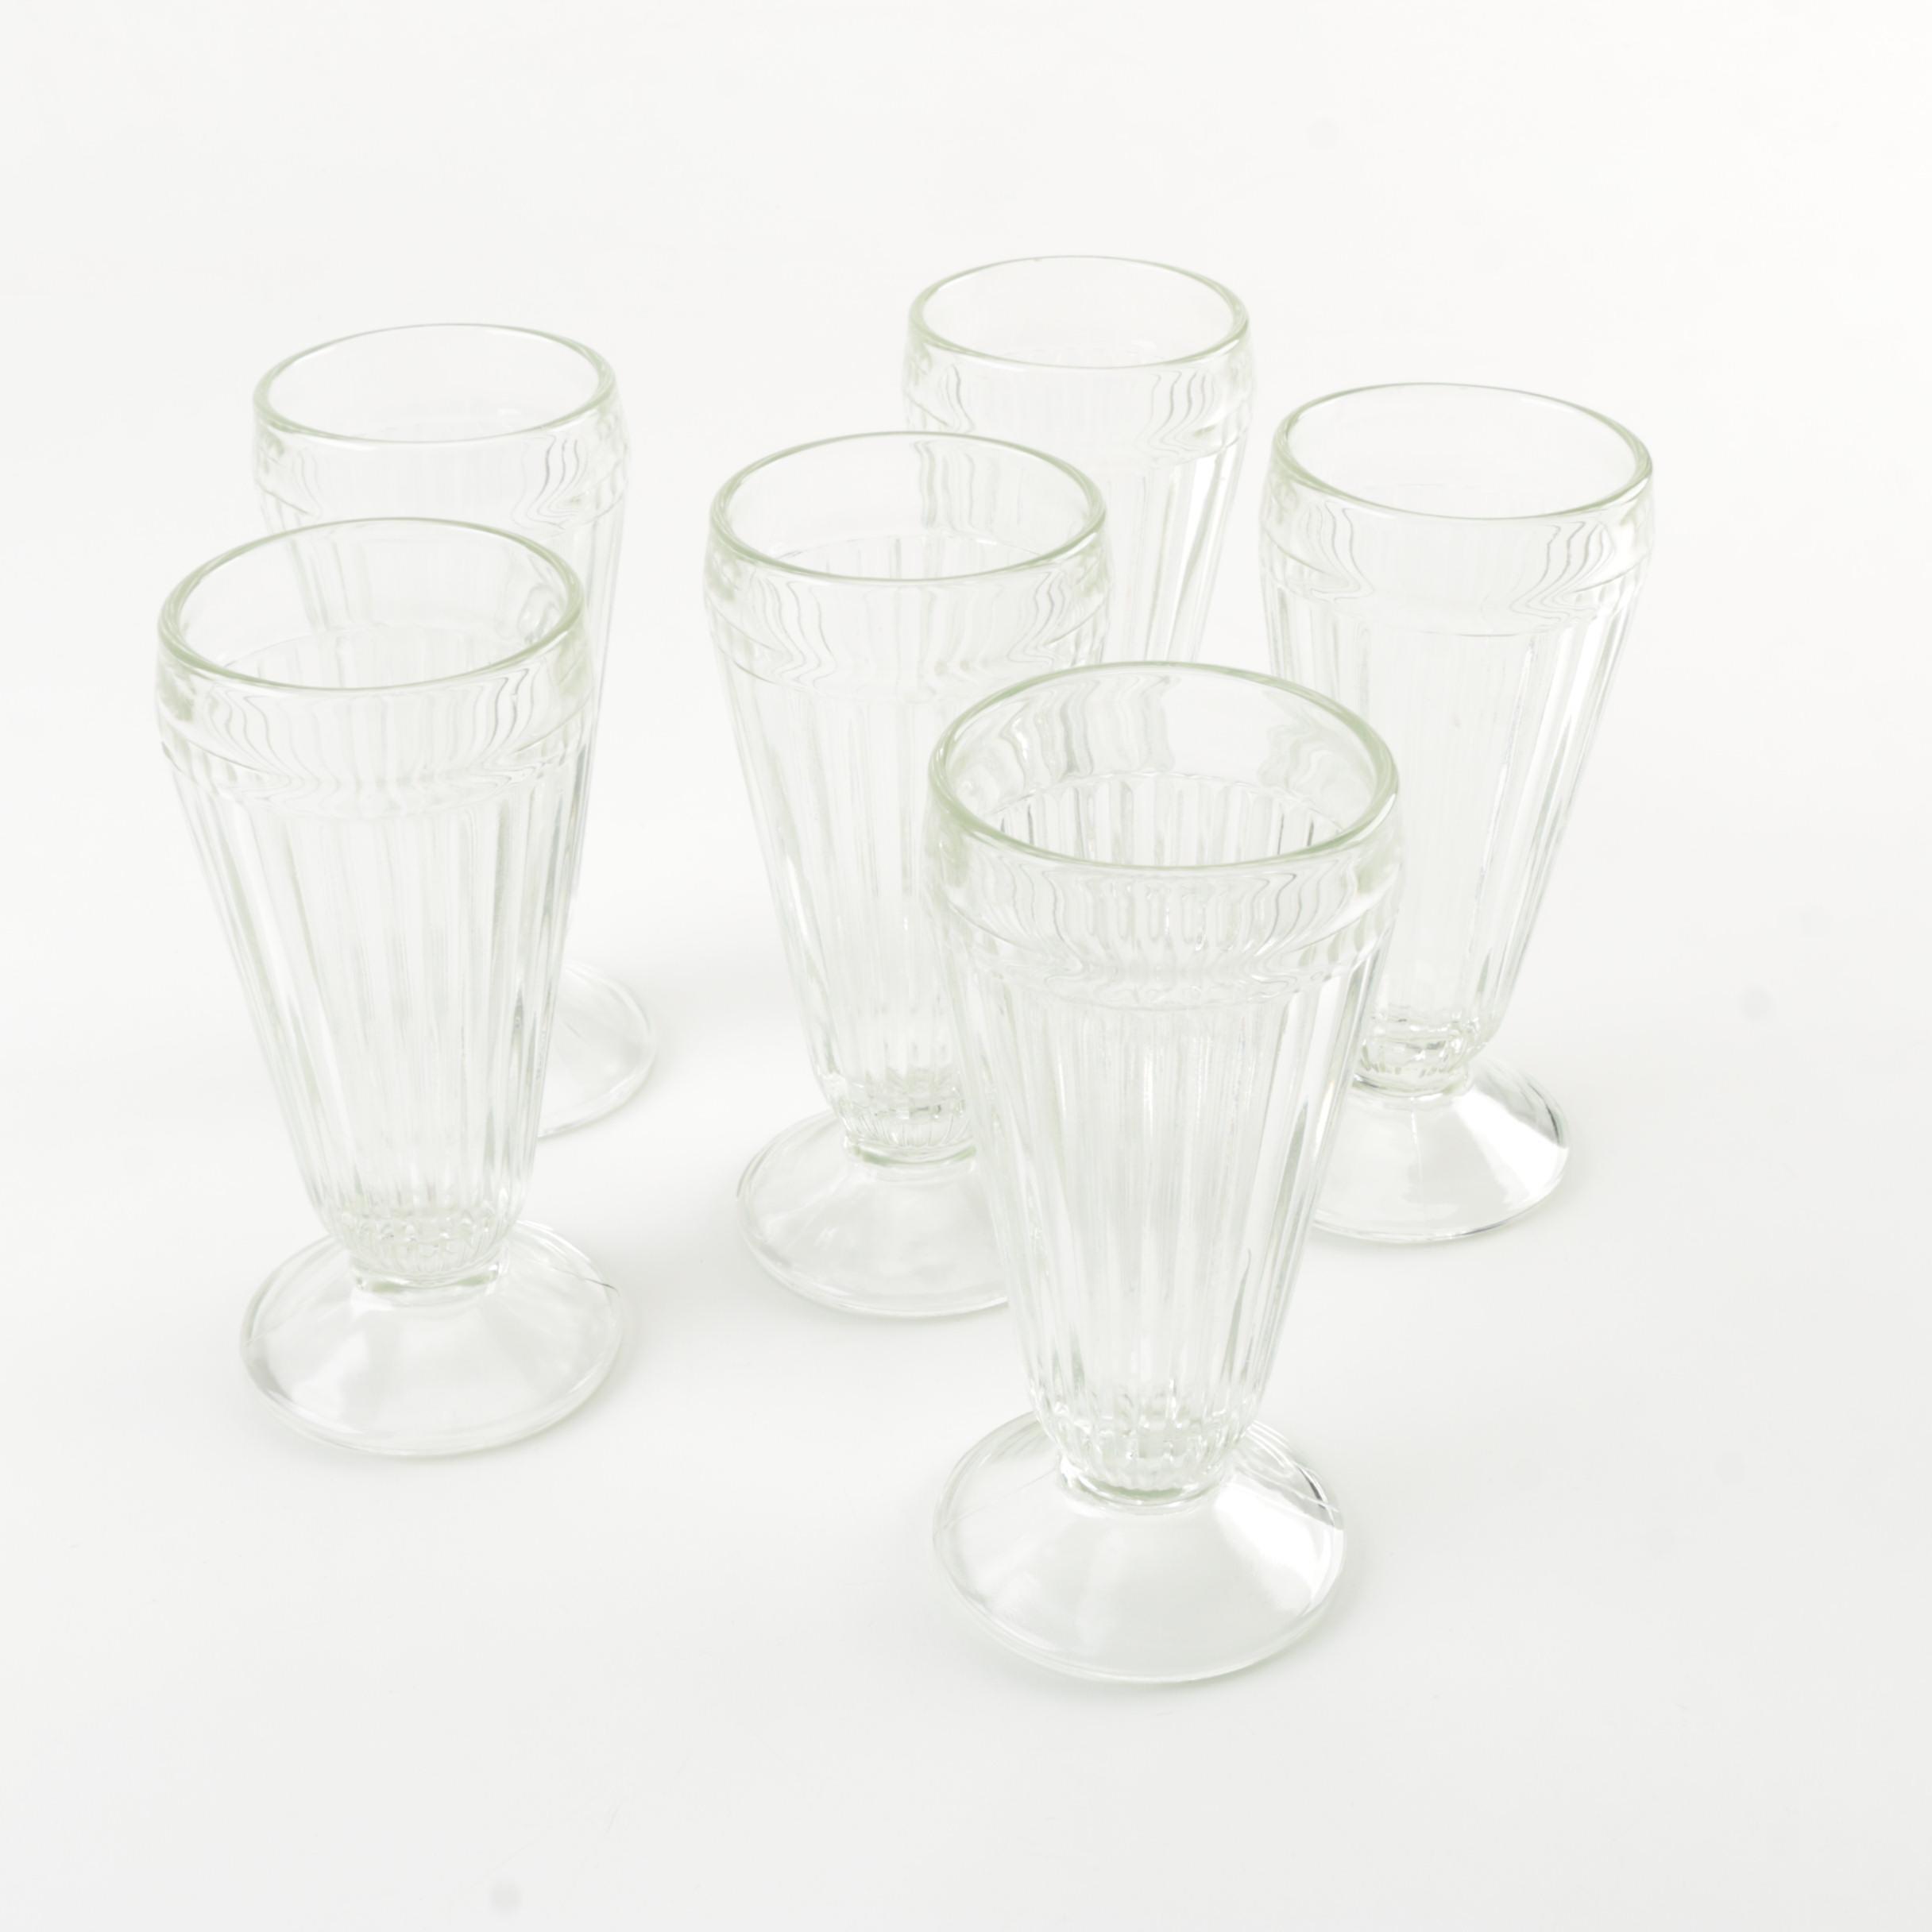 Six Clear Milkshake Glasses